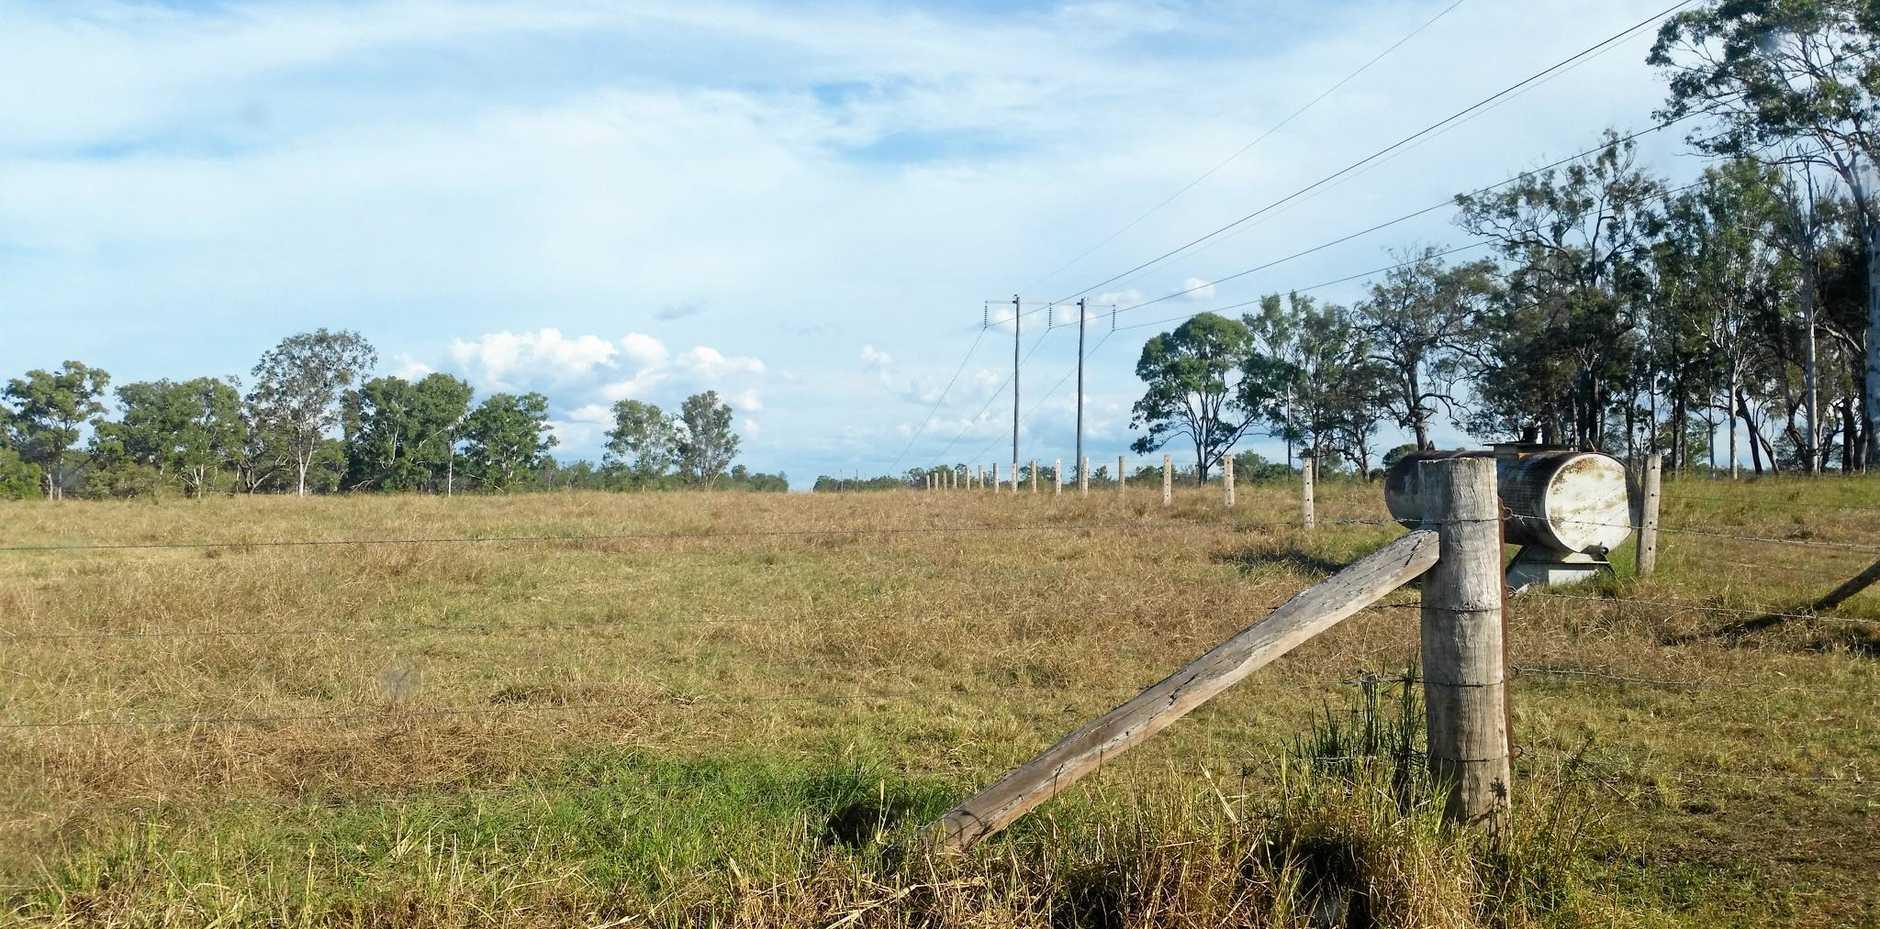 The future site of Eco Energy World's (EEW) solar farm at Aramara.